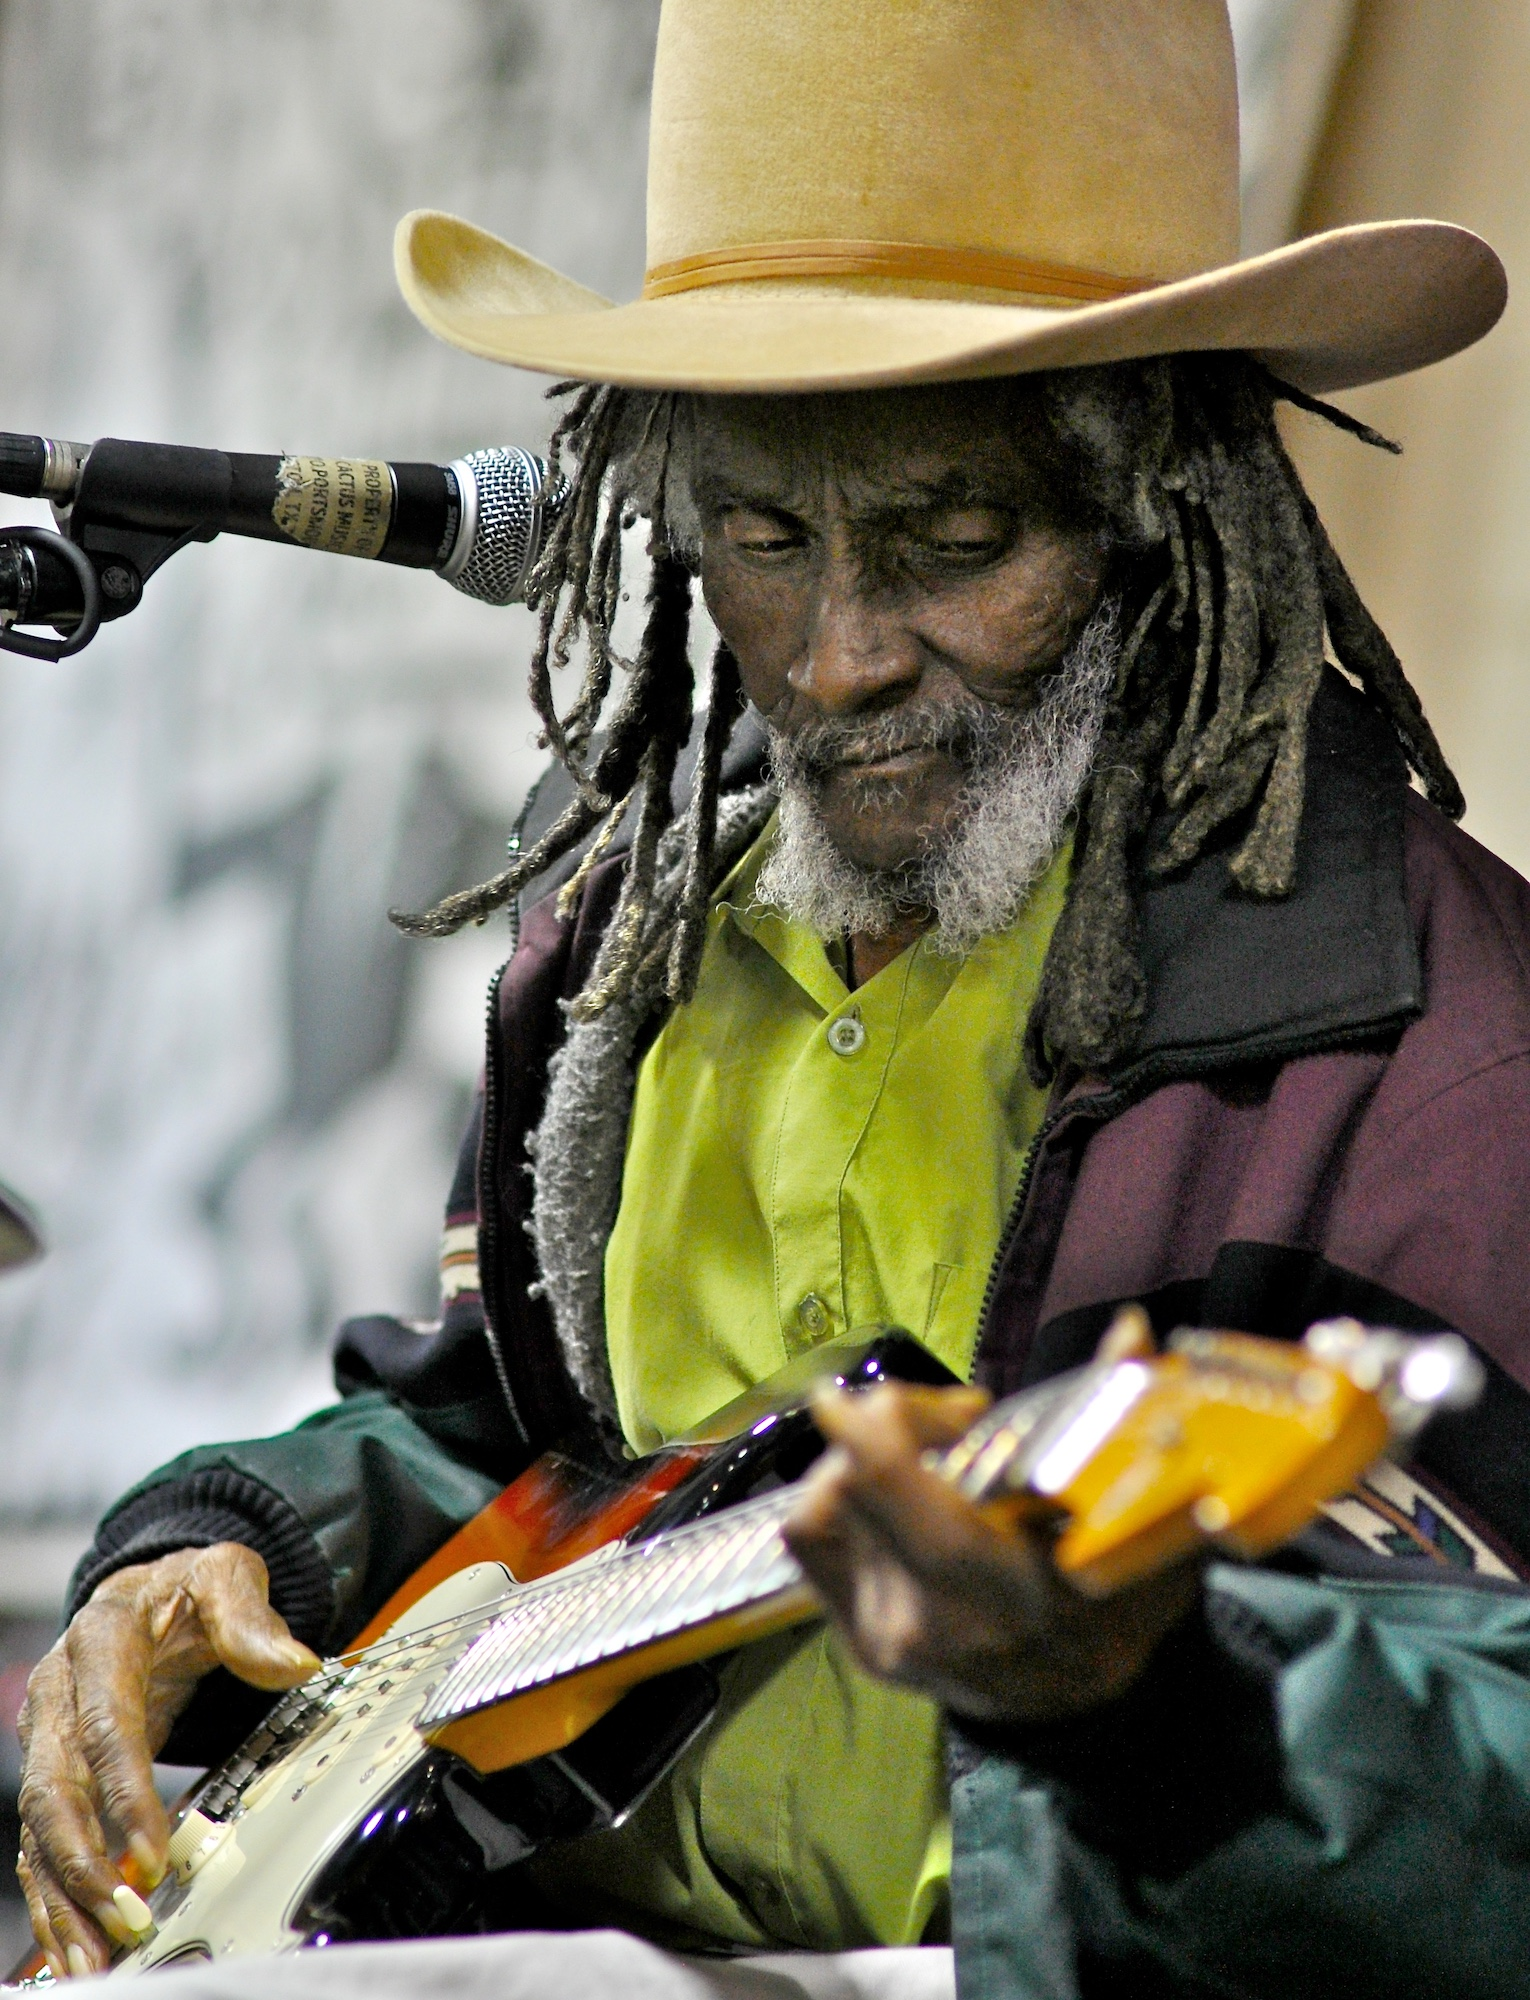 Little Joe Washington performs at Cactus Music. September 22, 2010